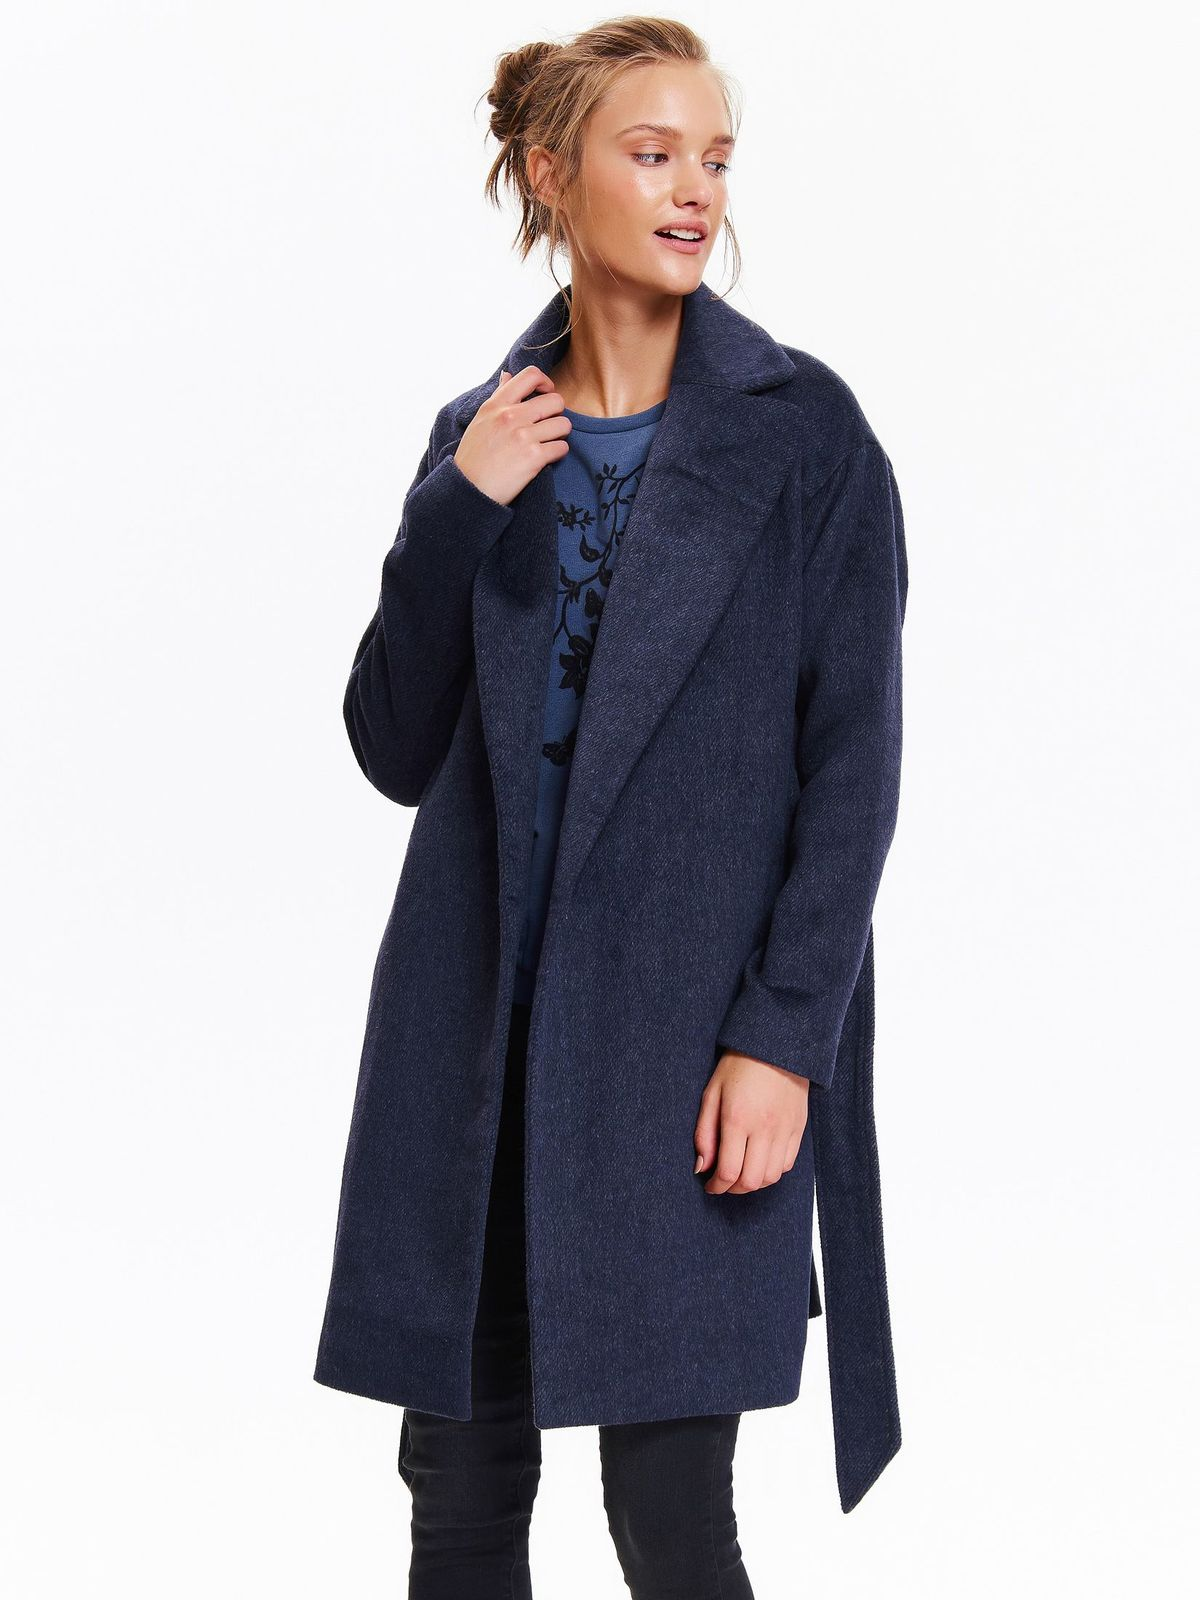 TOP SECRET TOP SECRET γυναικειο μακρυ παλτο